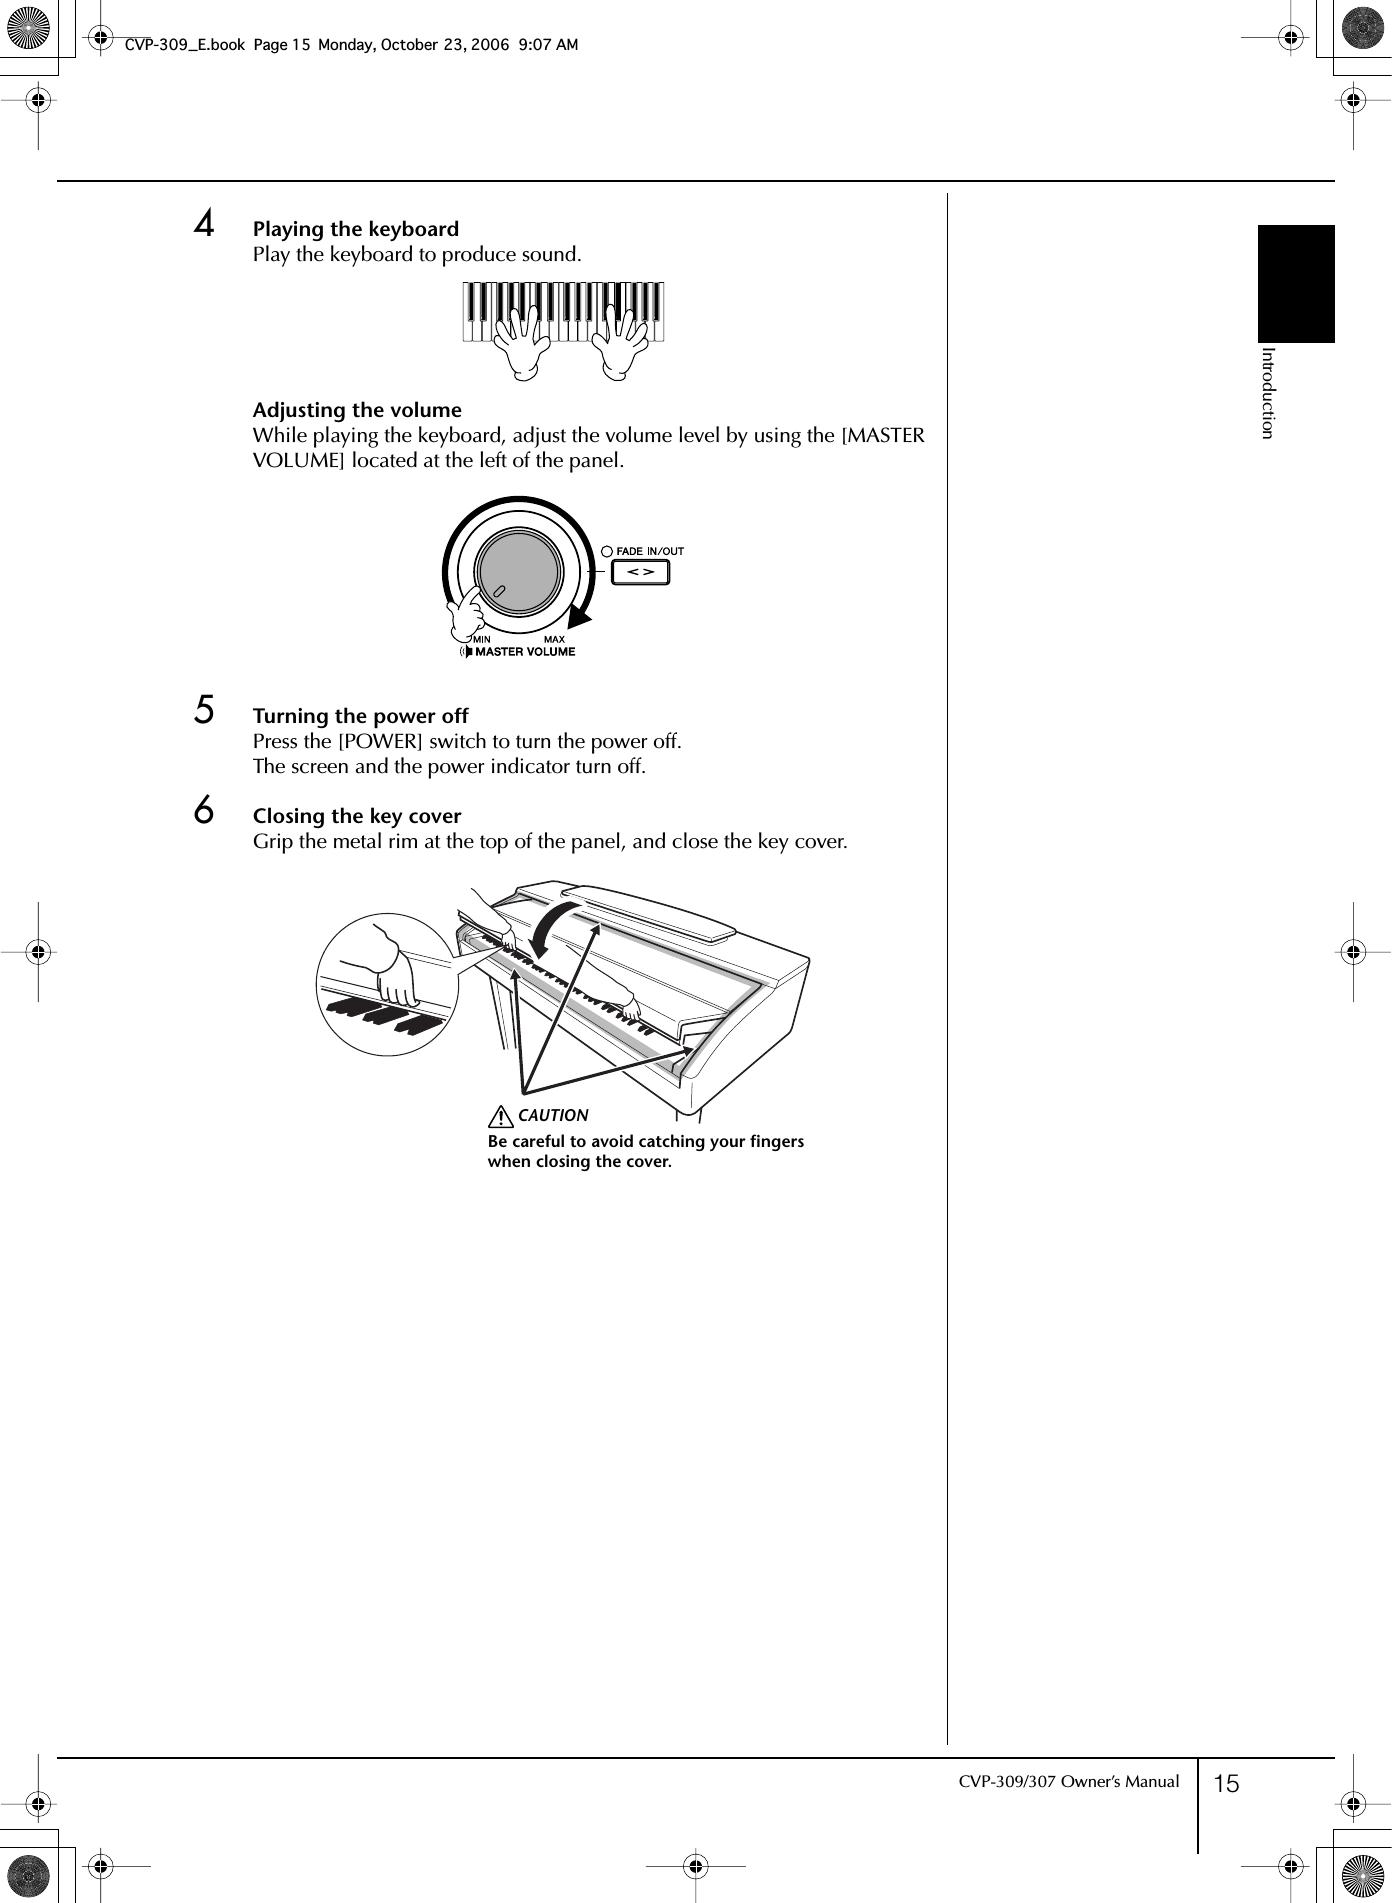 Audi Car Alarm Wiring Diagrams Modified Life Review Ebooks